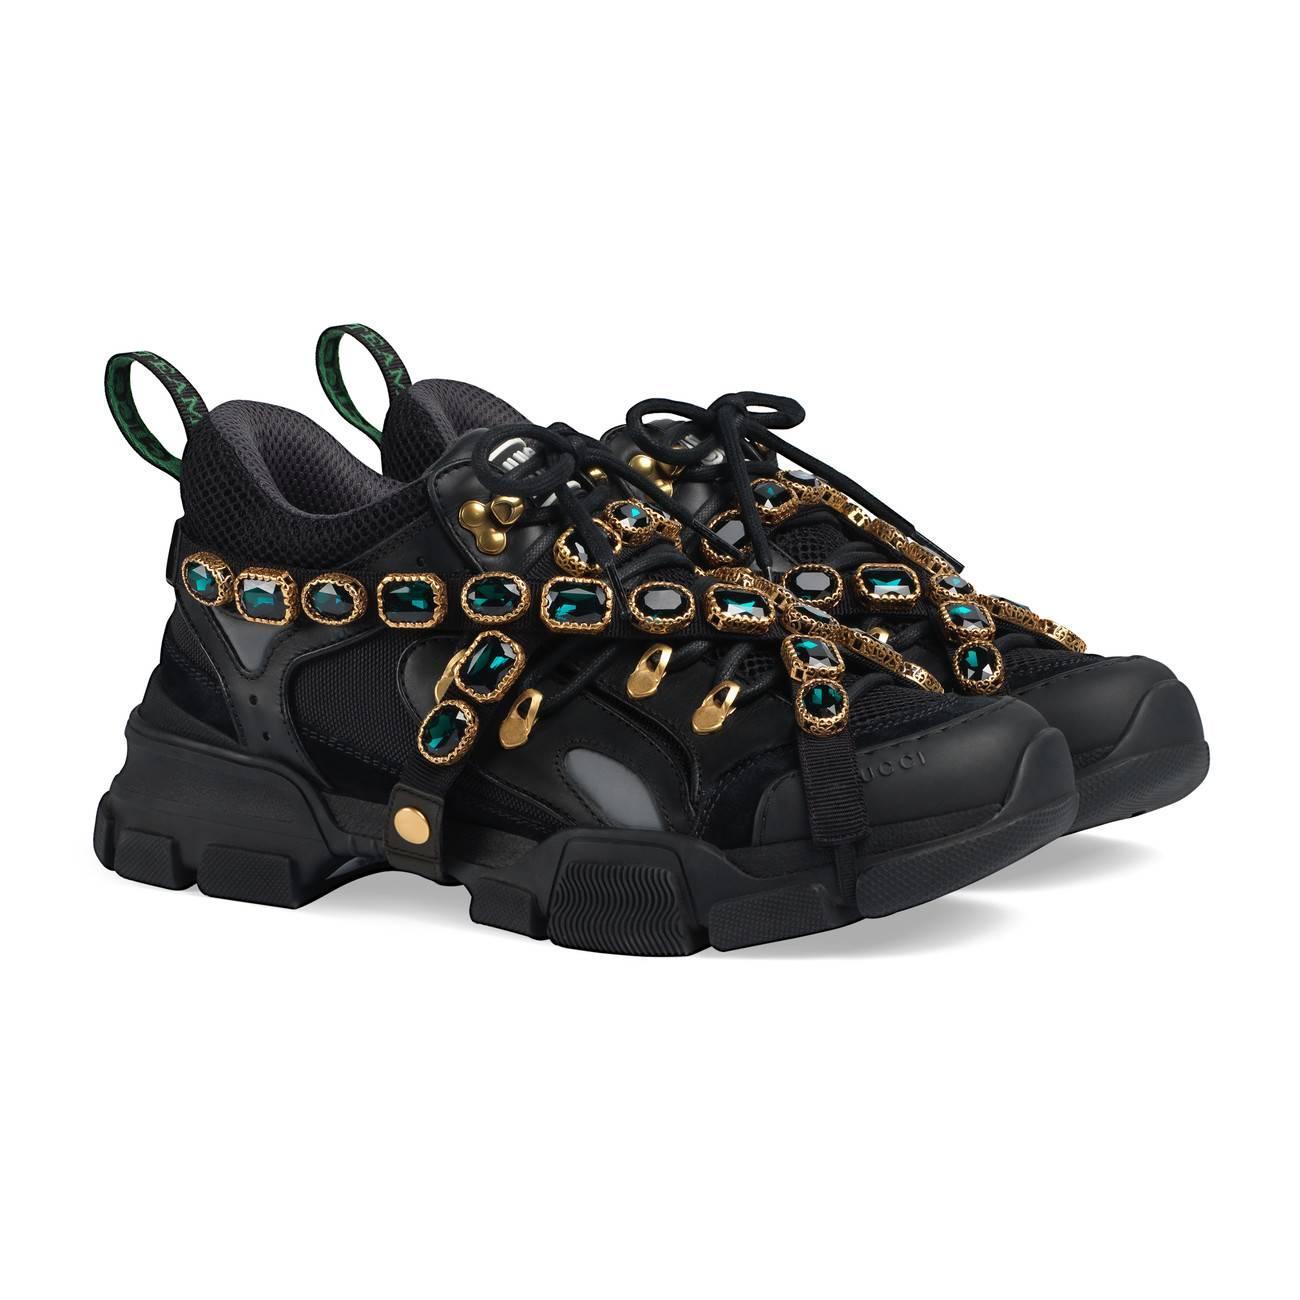 7e8269ec46de ... Flashtrek Leather Sneaker With Crystals for Men - Lyst. View fullscreen